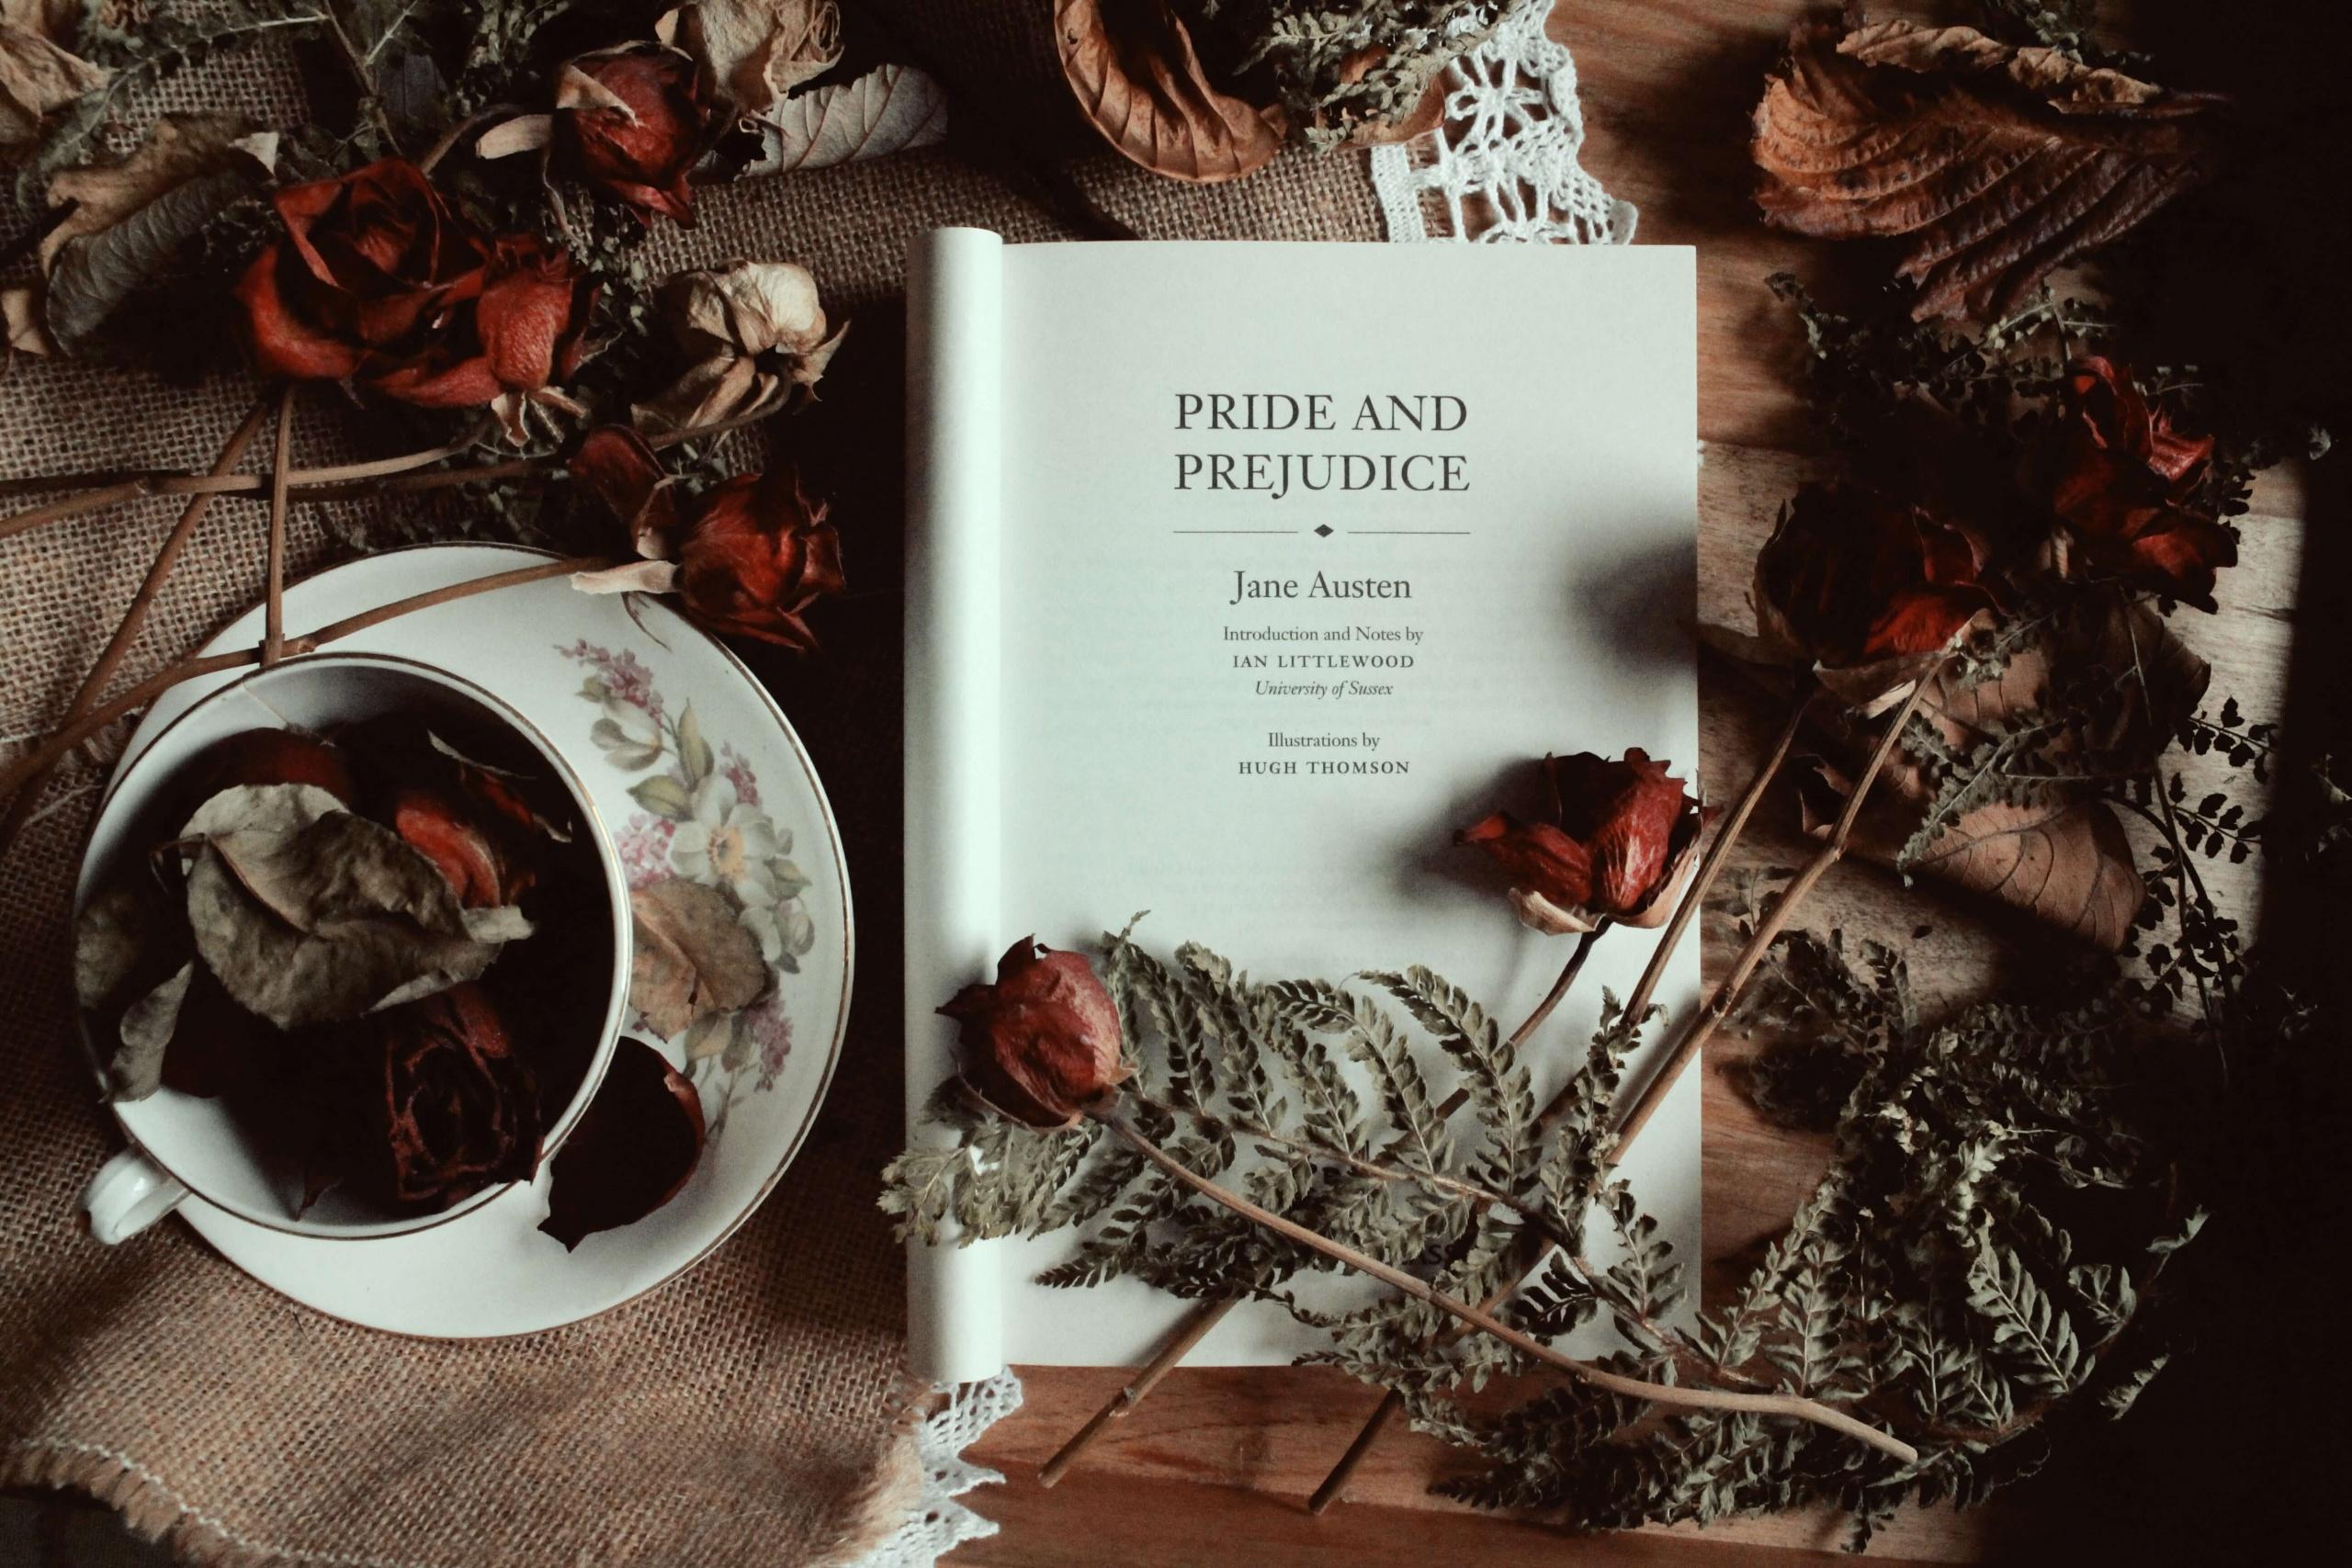 pride and prejudice classic book recommendation